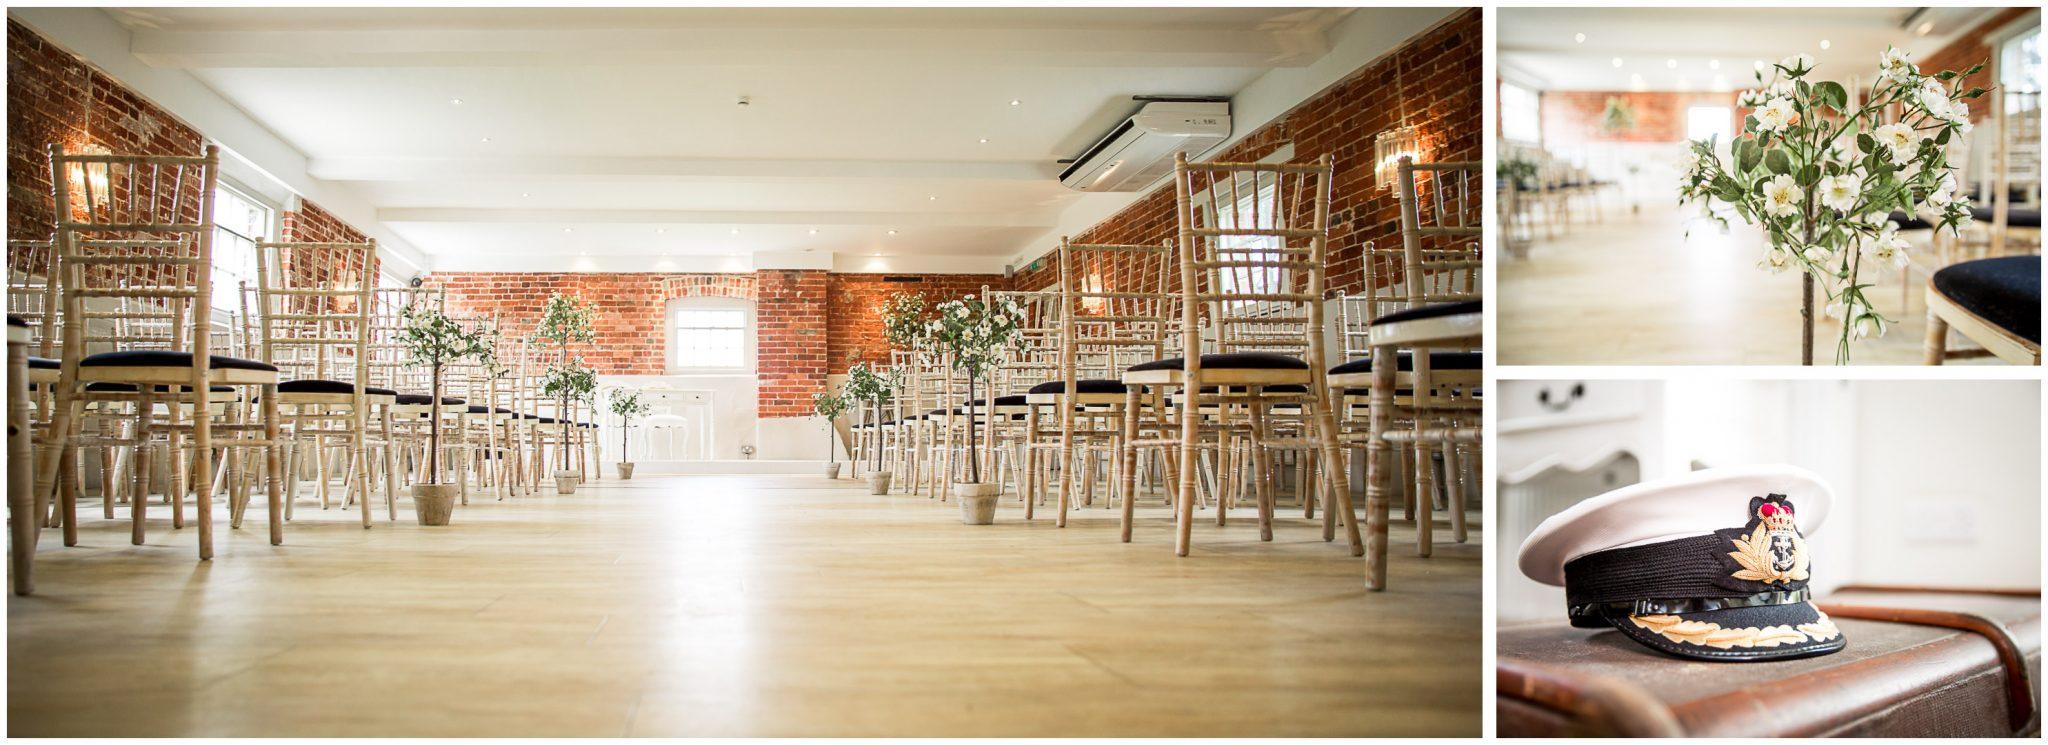 Sopley wedding photographer ceremony room